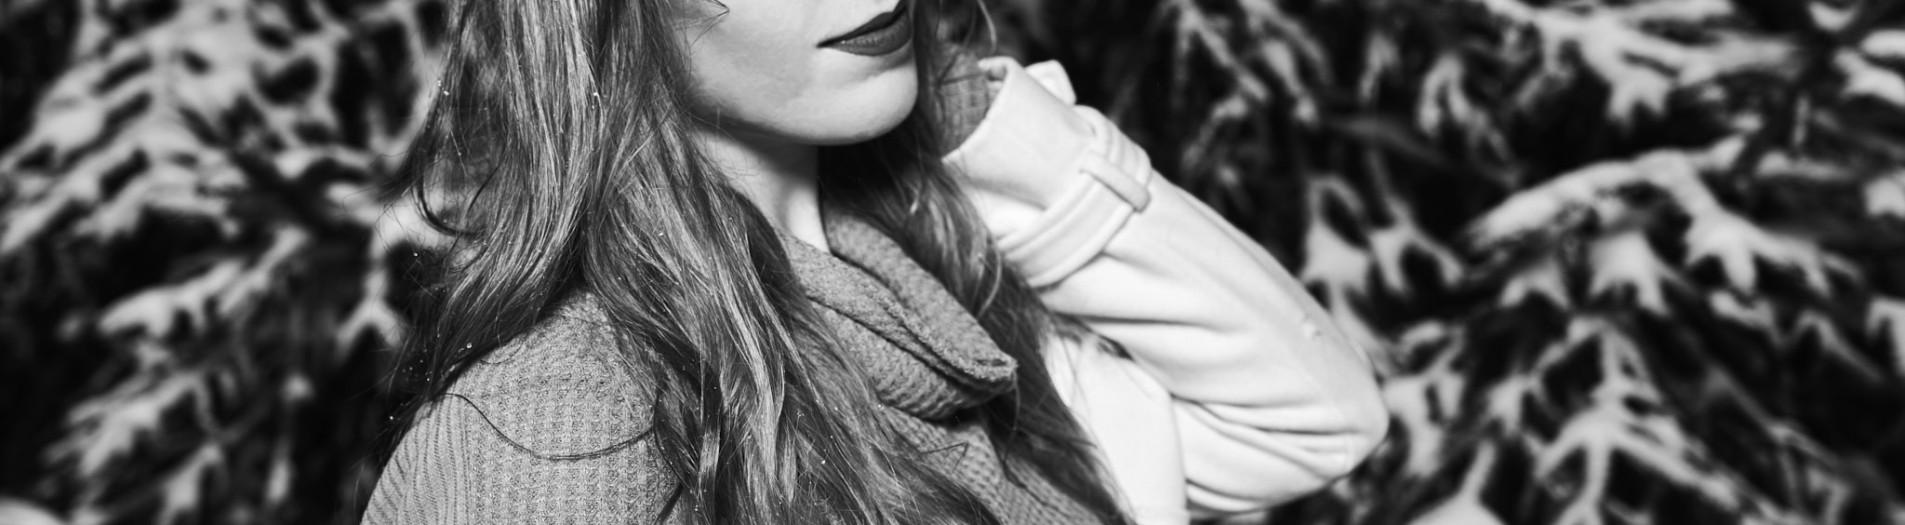 Diana R : Model | Lifestyle Snow Portrait Session | Studio ccojr